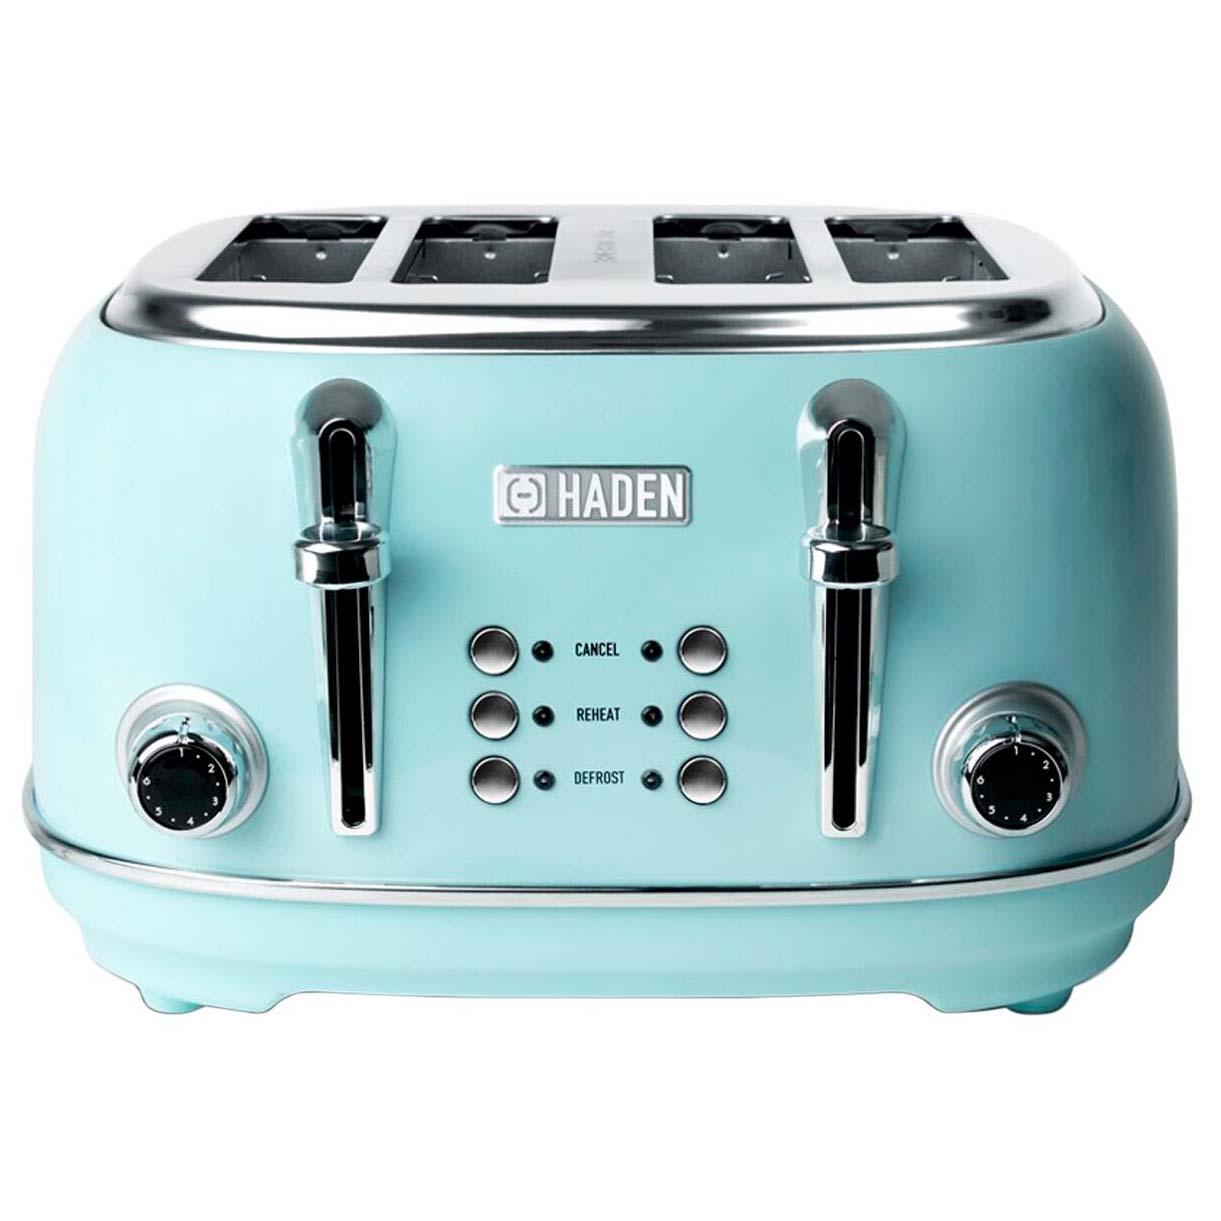 Haden Burgandy 2 Slice Toaster with wide slots